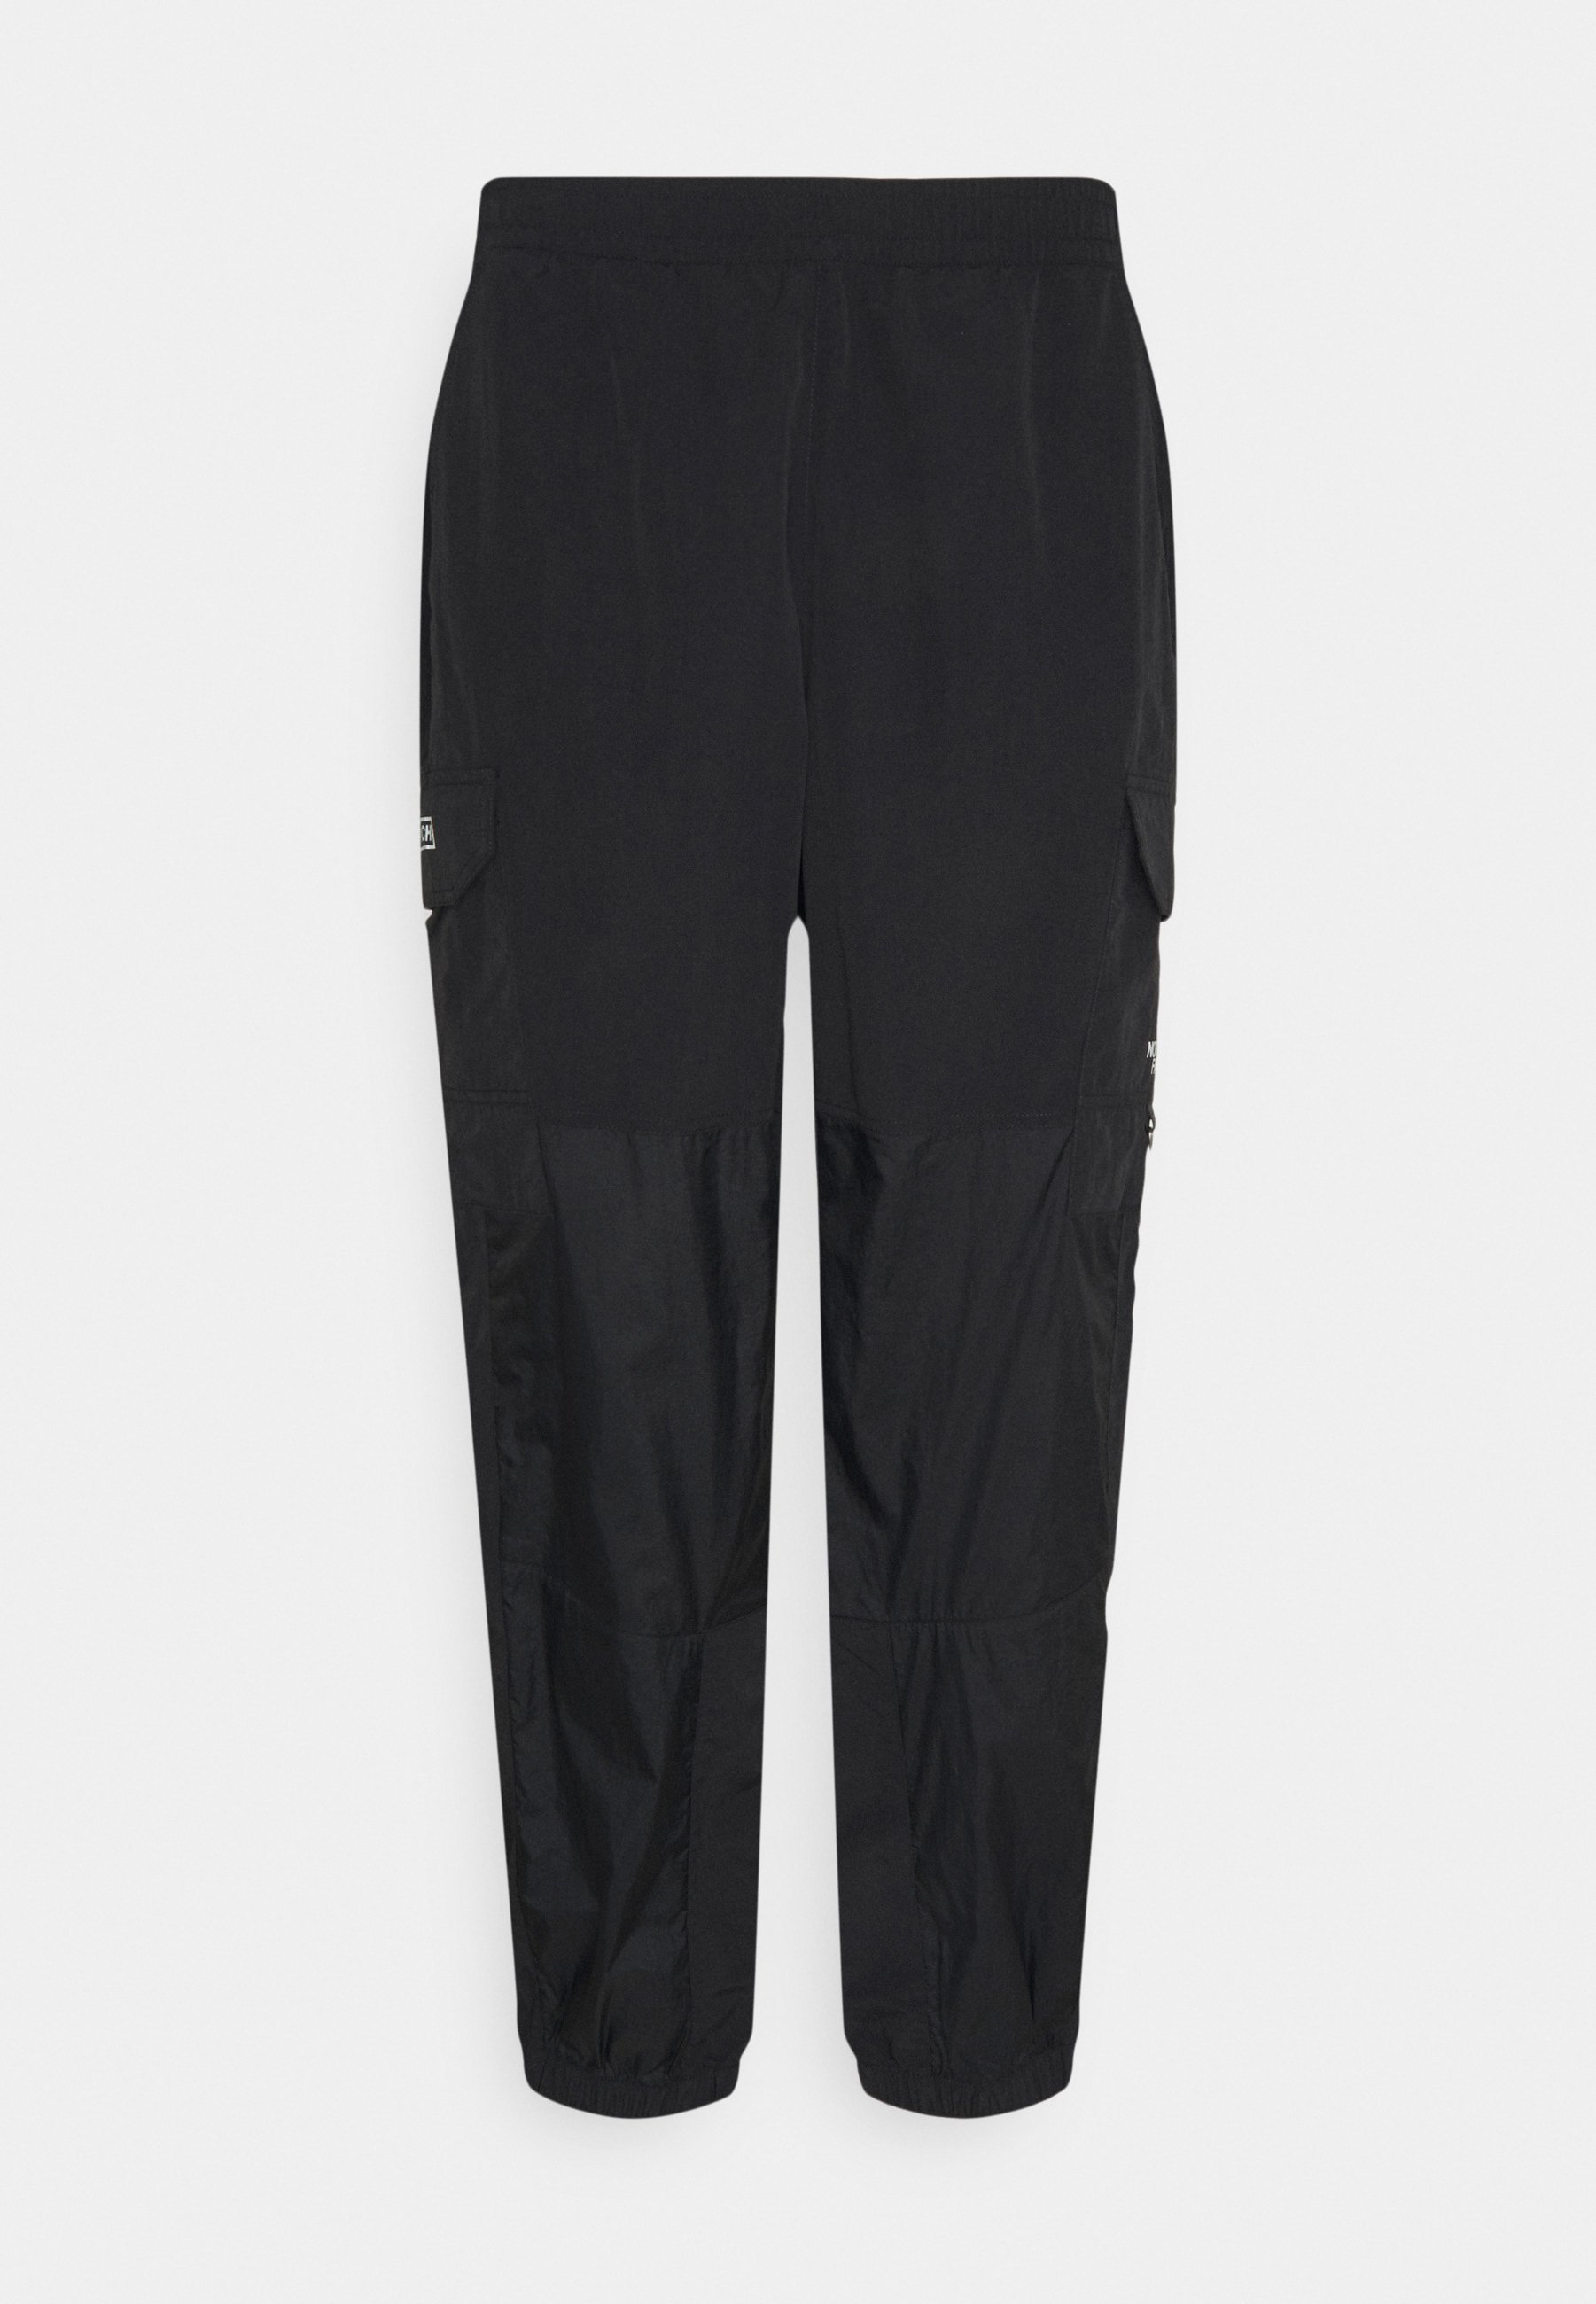 Homme STEEP TECH LIGHT PANT - Pantalon cargo